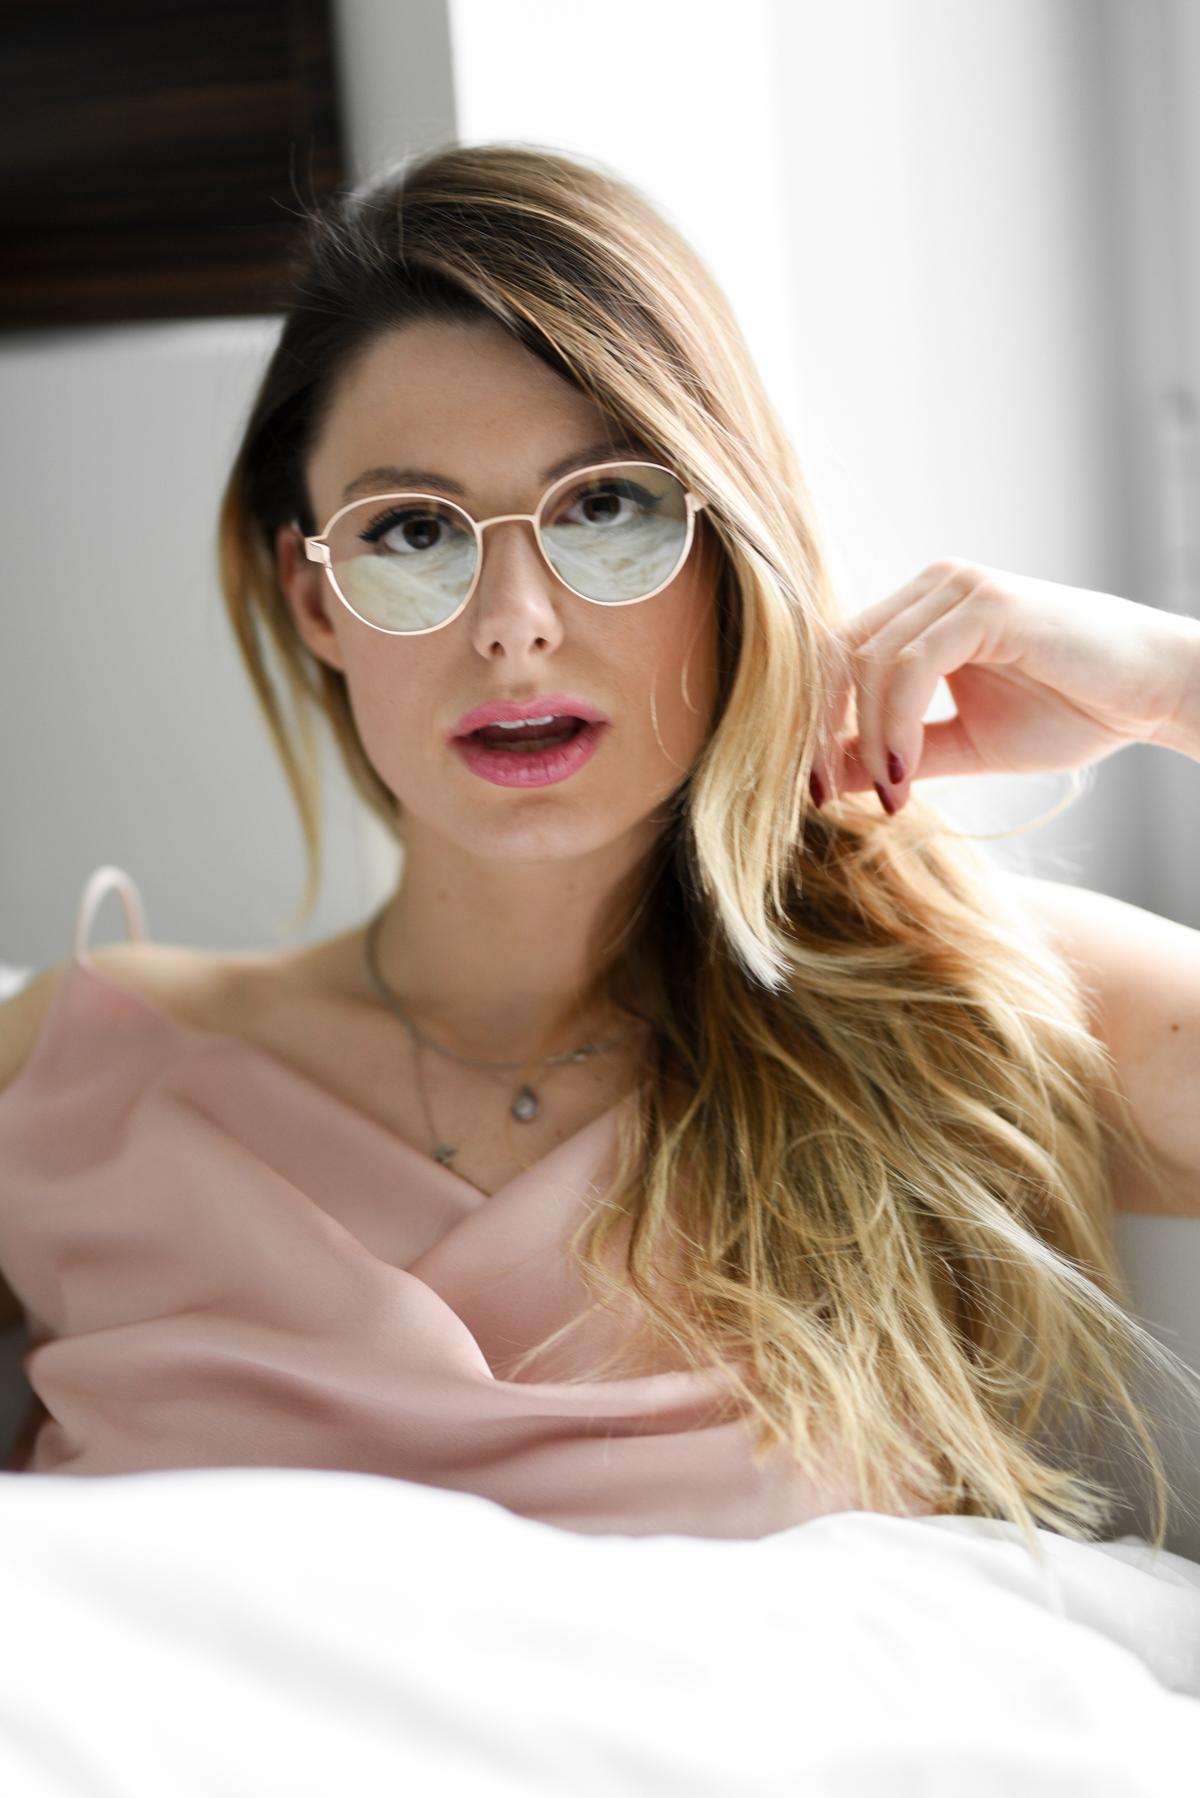 Falvin eyewear denmark danish giulia de martin eyewear blogger sunglasses eyeglasses eyewear behind my glasses influencer (1 di 10)-1